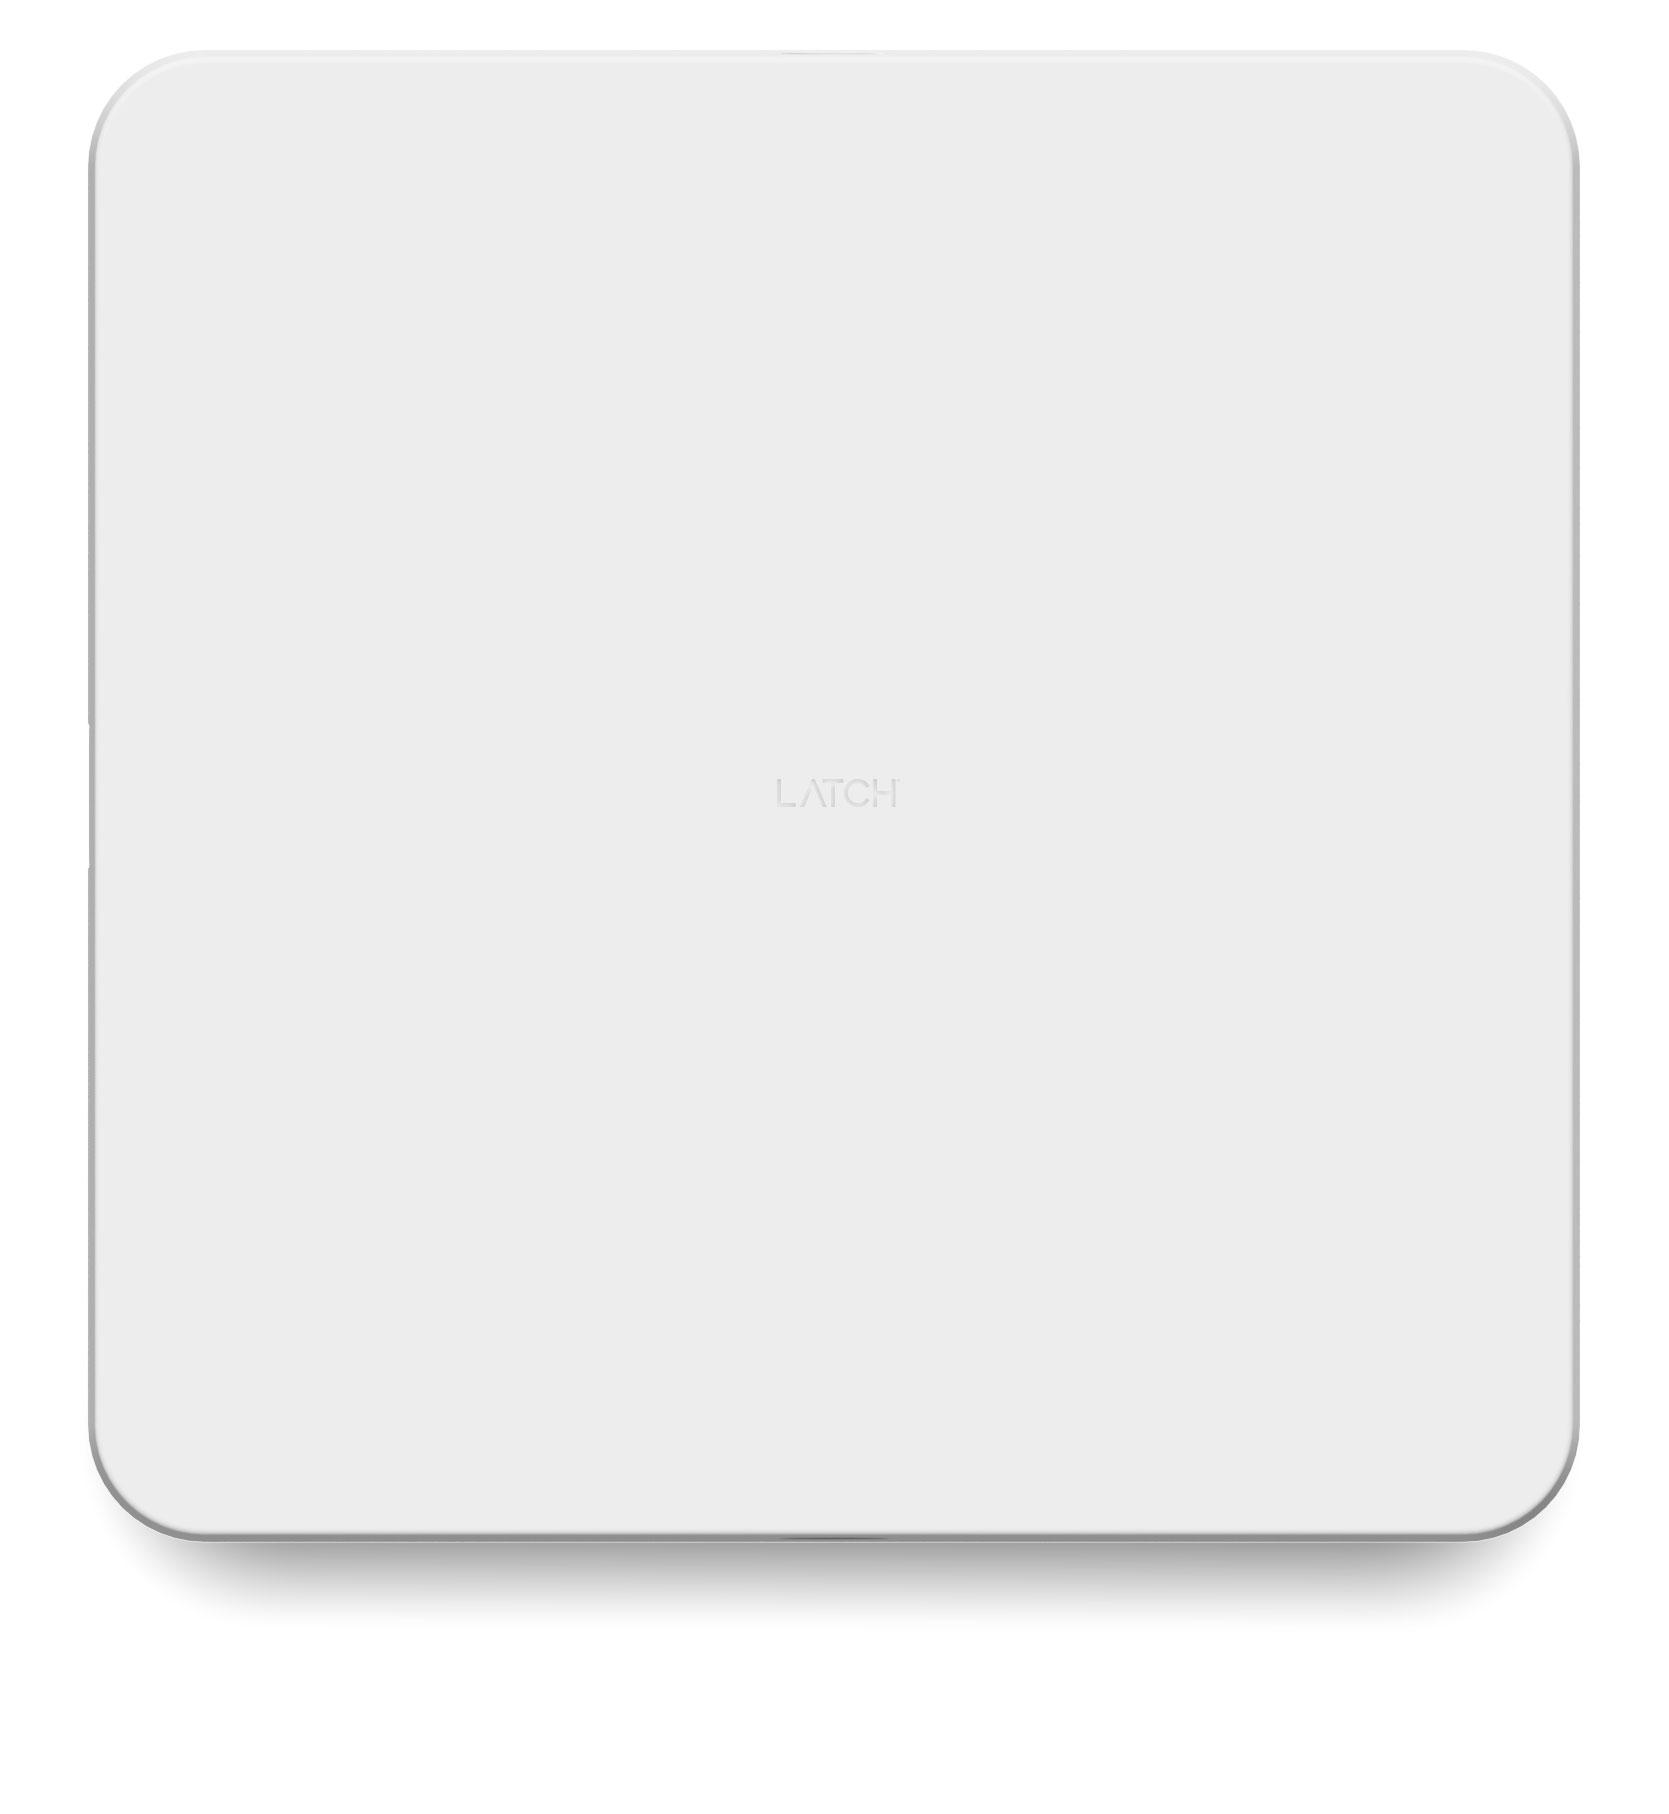 Latch Hub white hardware